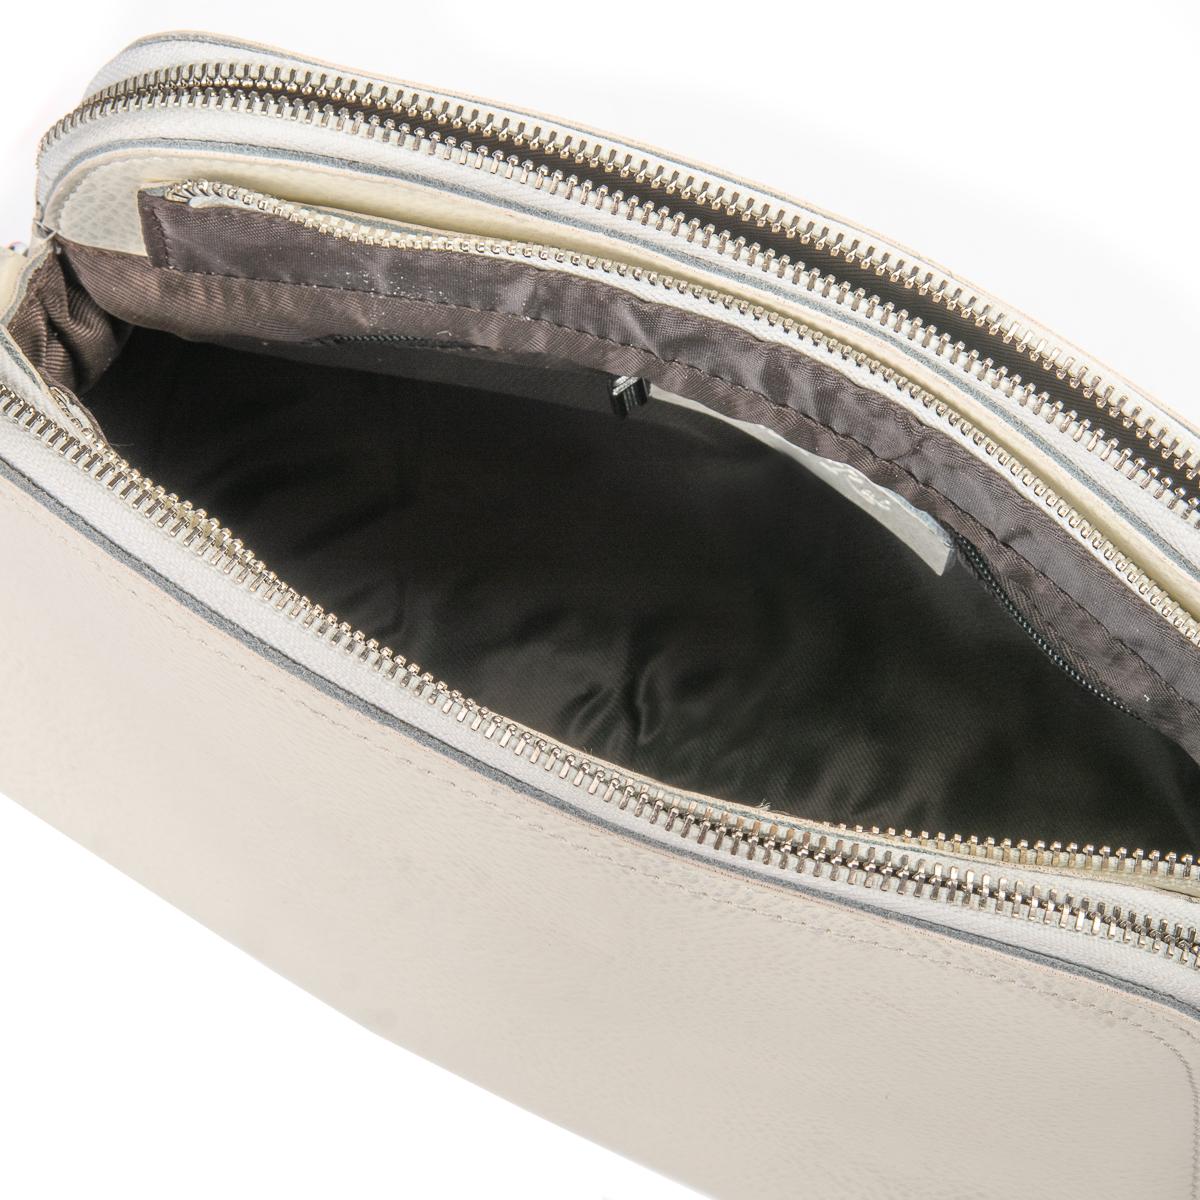 Сумка Женская Клатч кожа ALEX RAI 06-1 8725 bead ight-white